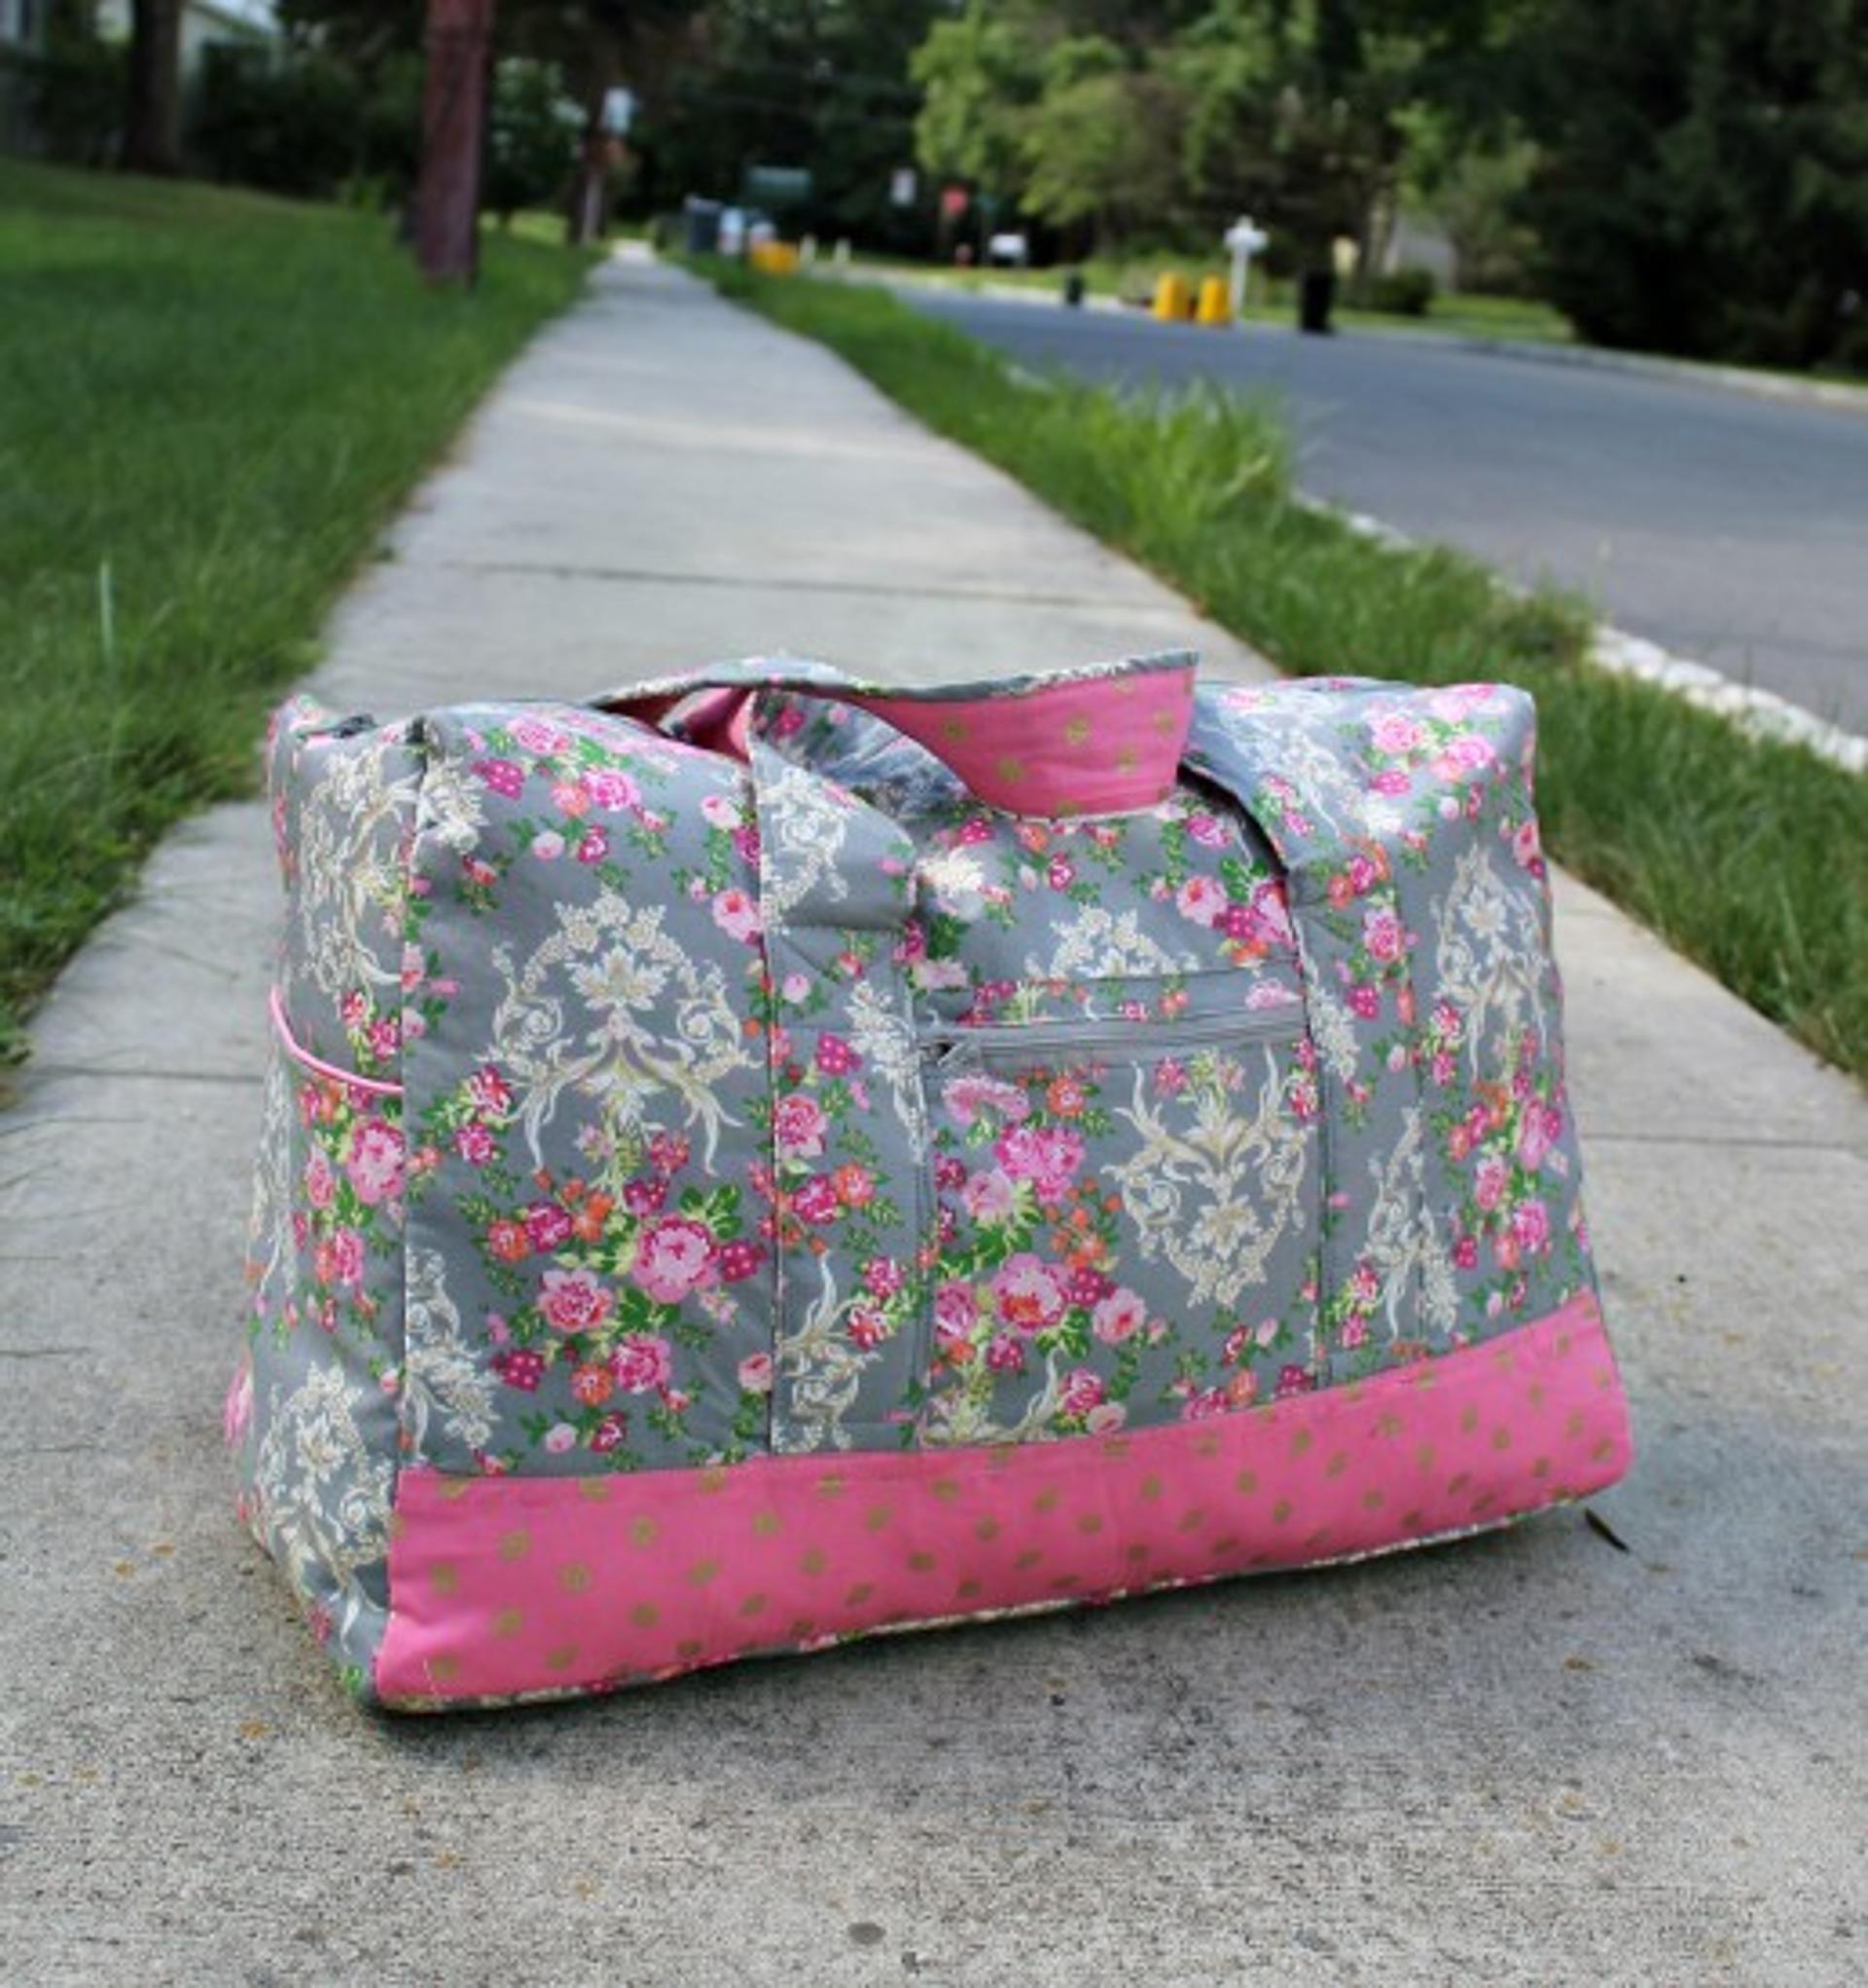 cfb3c5e0d9 Vera Bradley Inspired Carryon Duffel Bag